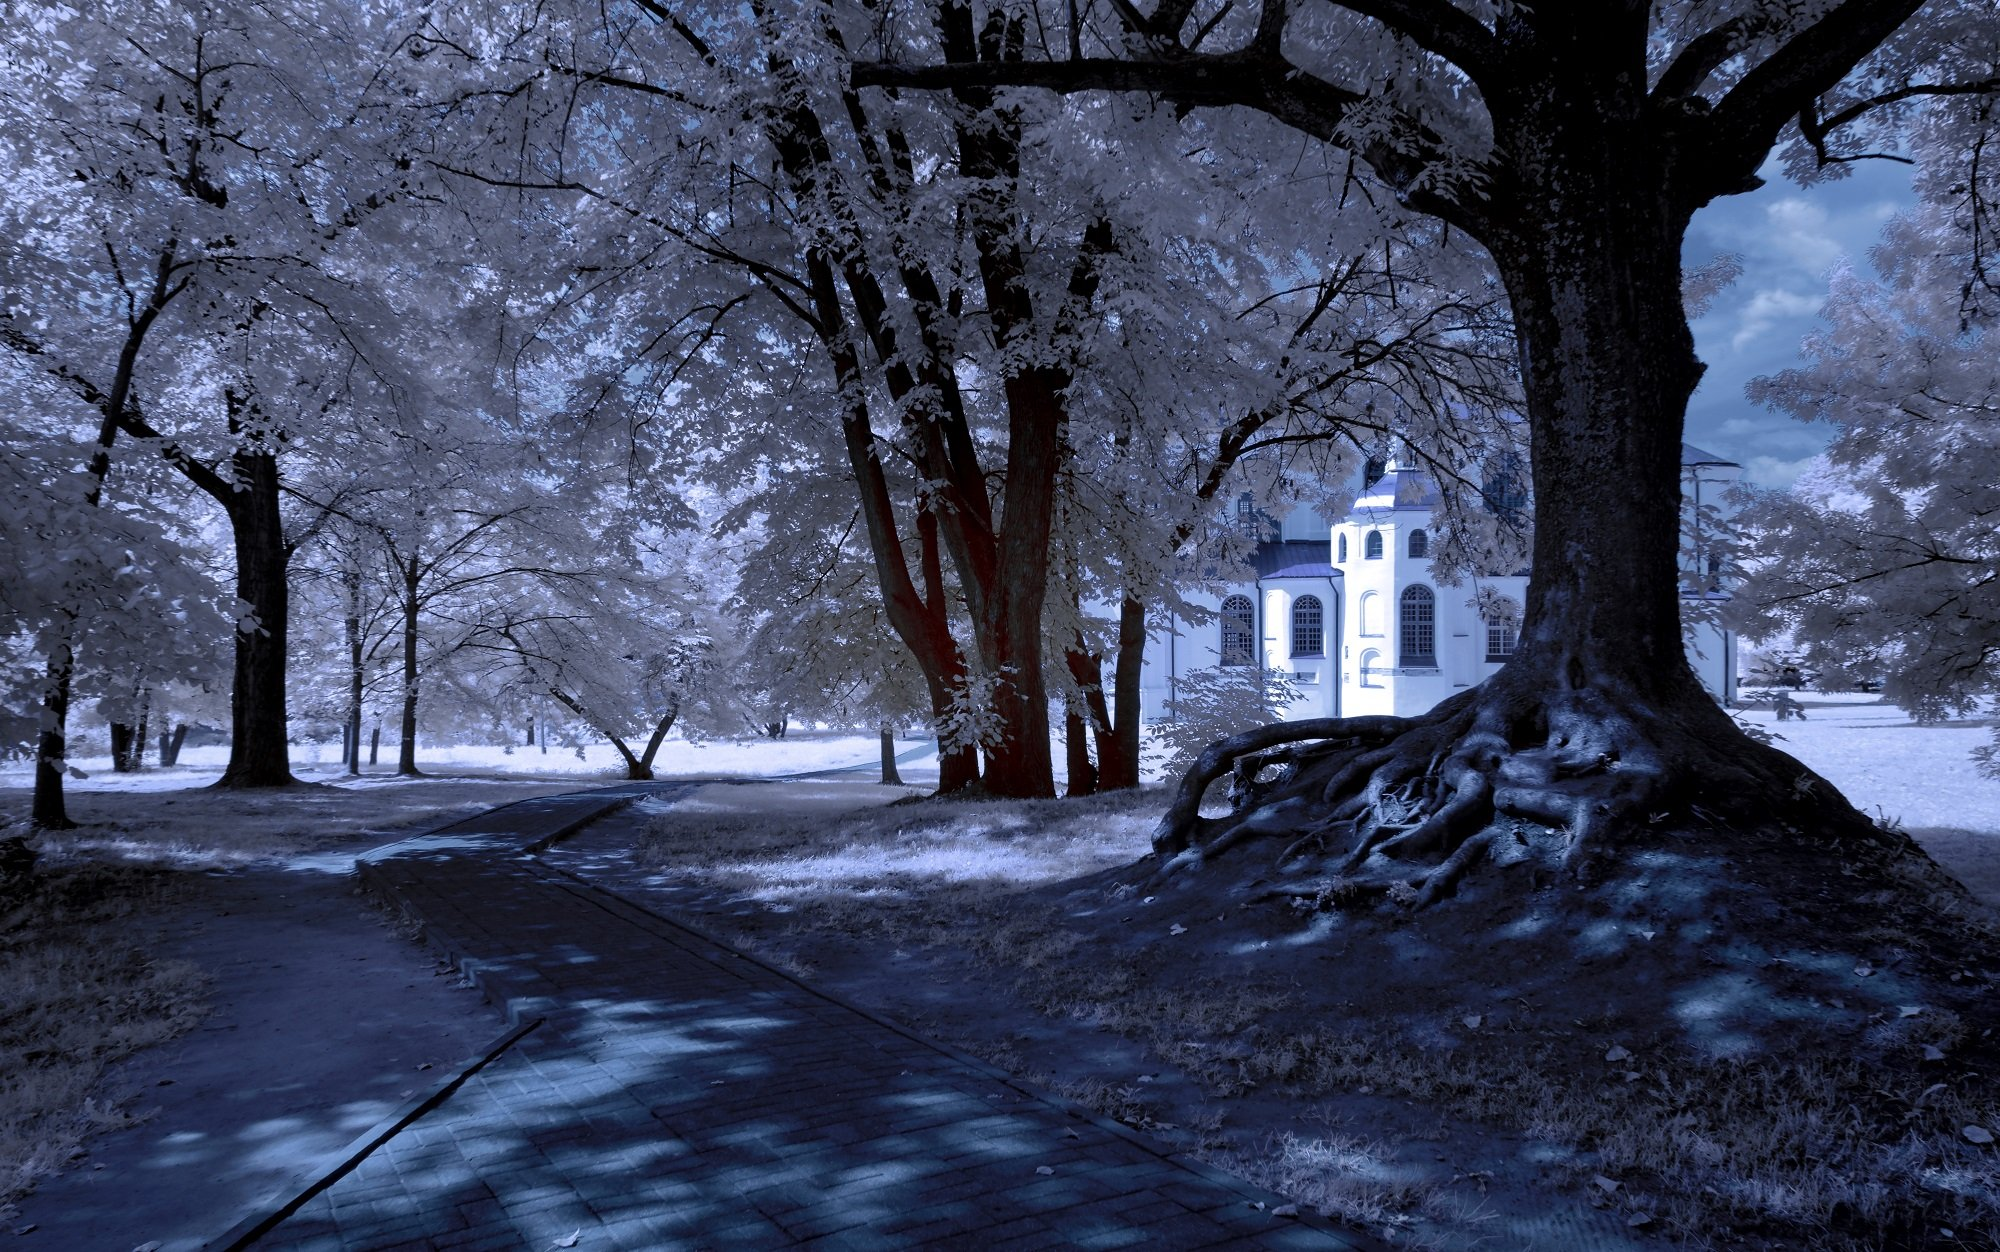 infrared,ик-фото,инфракрасное фото,инфракрасная фотография,пейзаж,беларусь,лето, Sixten ( Сергей )